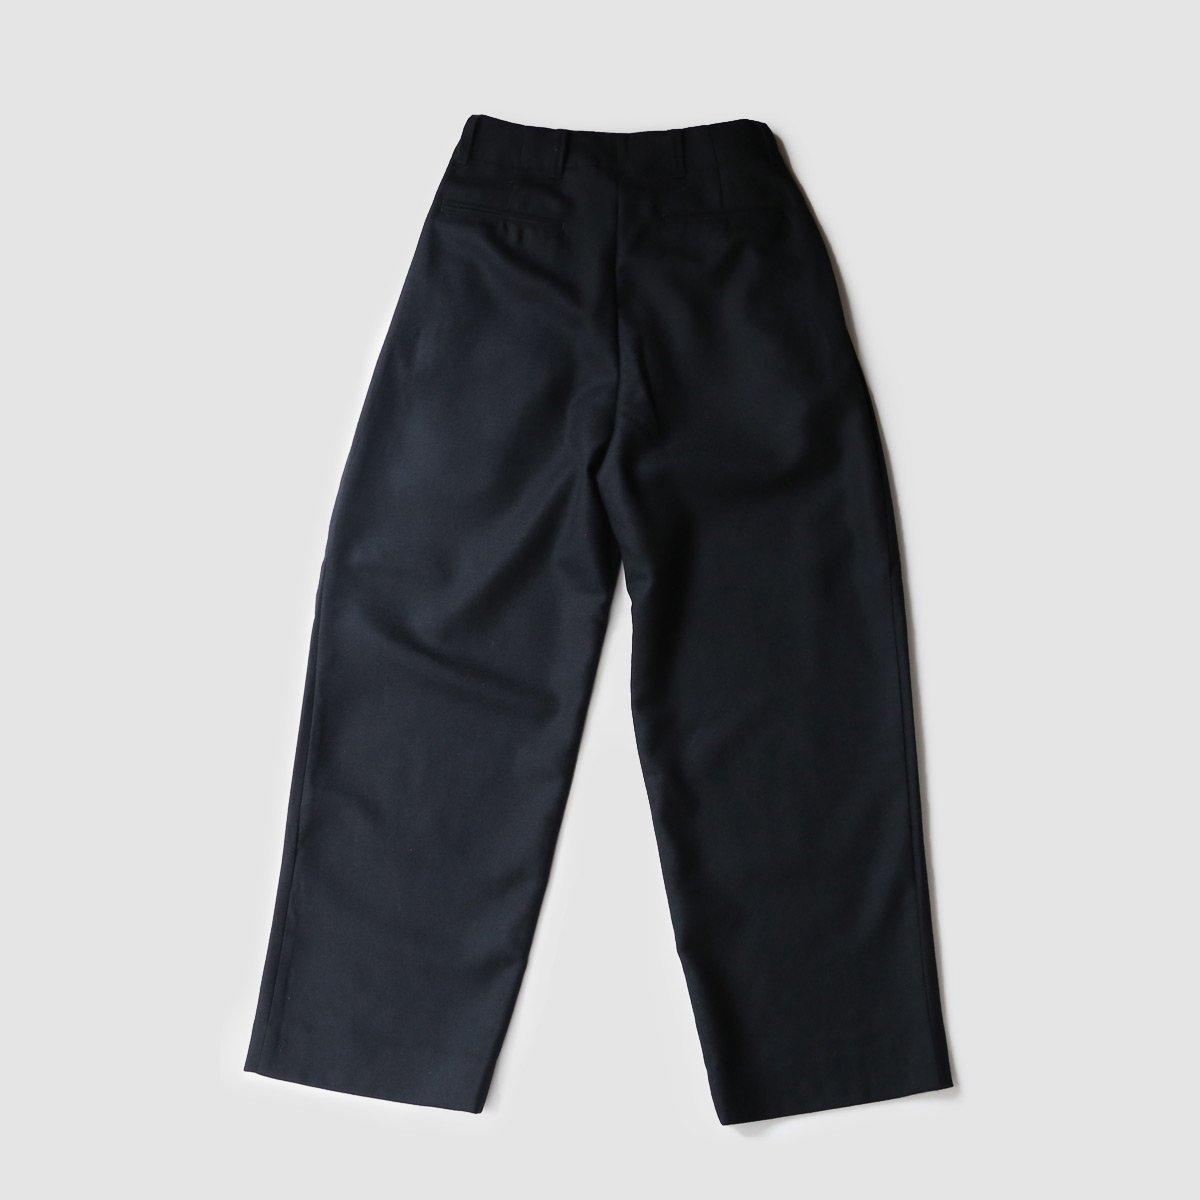 FREETUCK  PANTS 詳細画像3